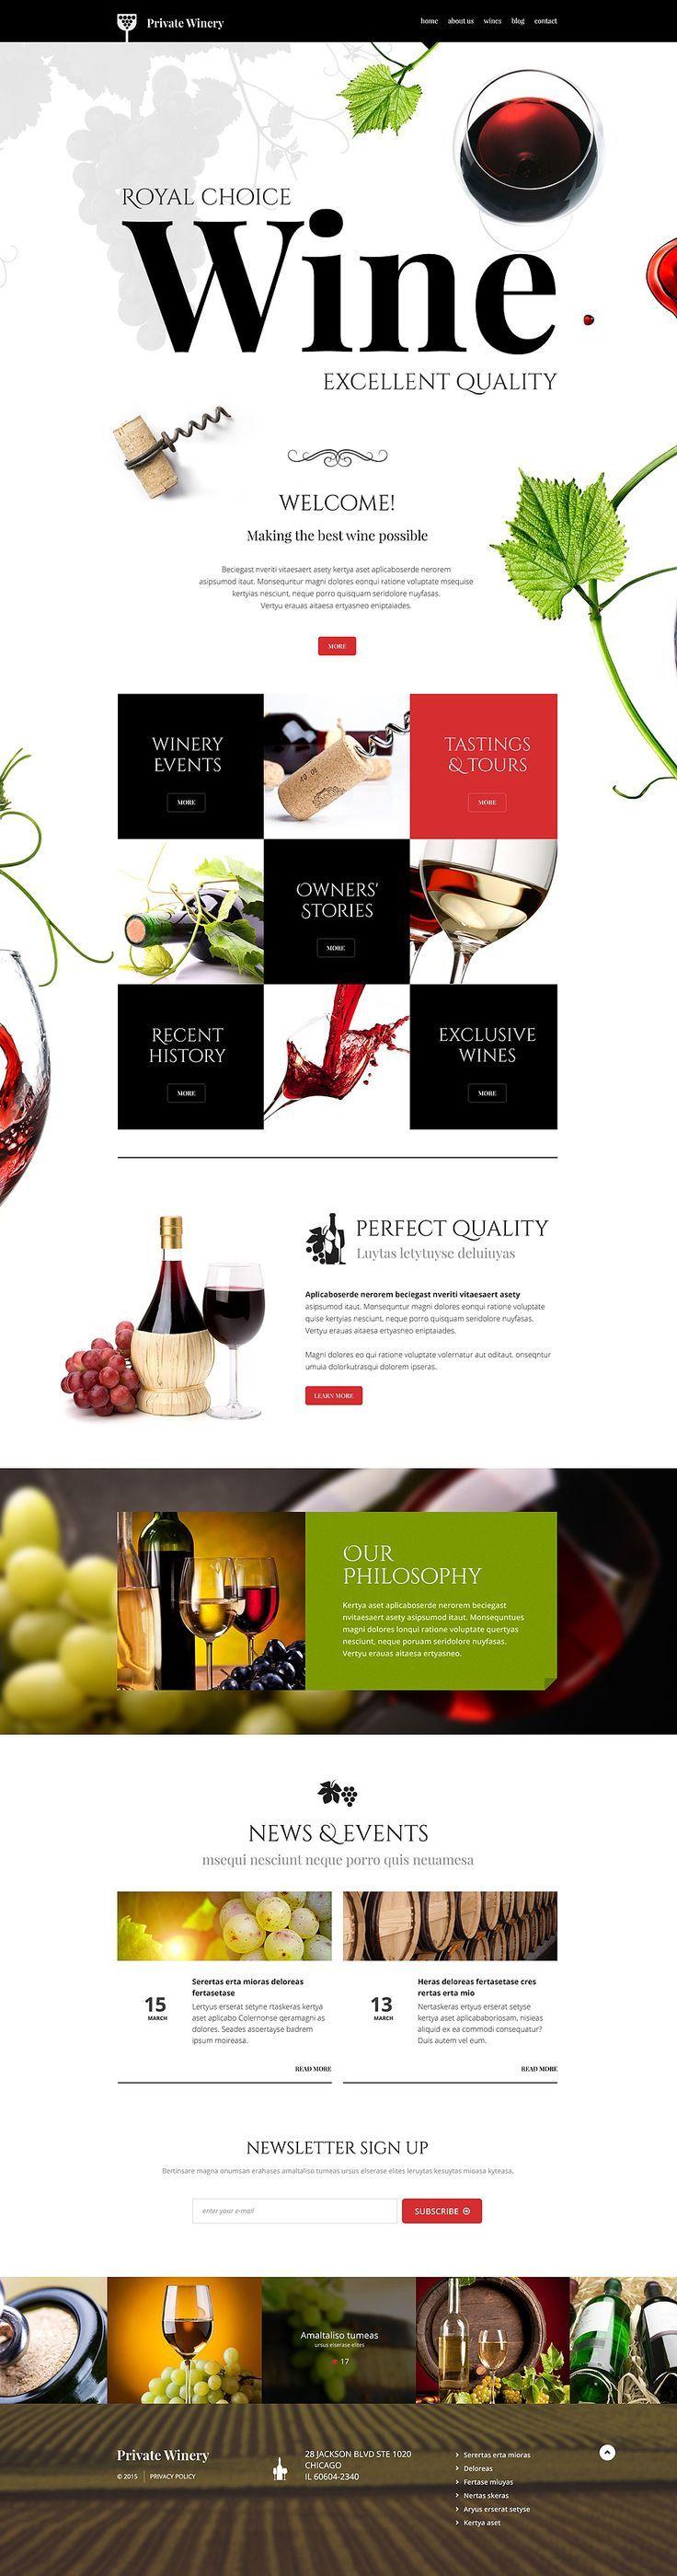 Private #Winery #WordPress Theme #restaurant #cafe http://www.templatemonster.com/wordpress-themes/54789.html?utm_source=Pinterest&utm_medium=timeline&utm_campaign=54789